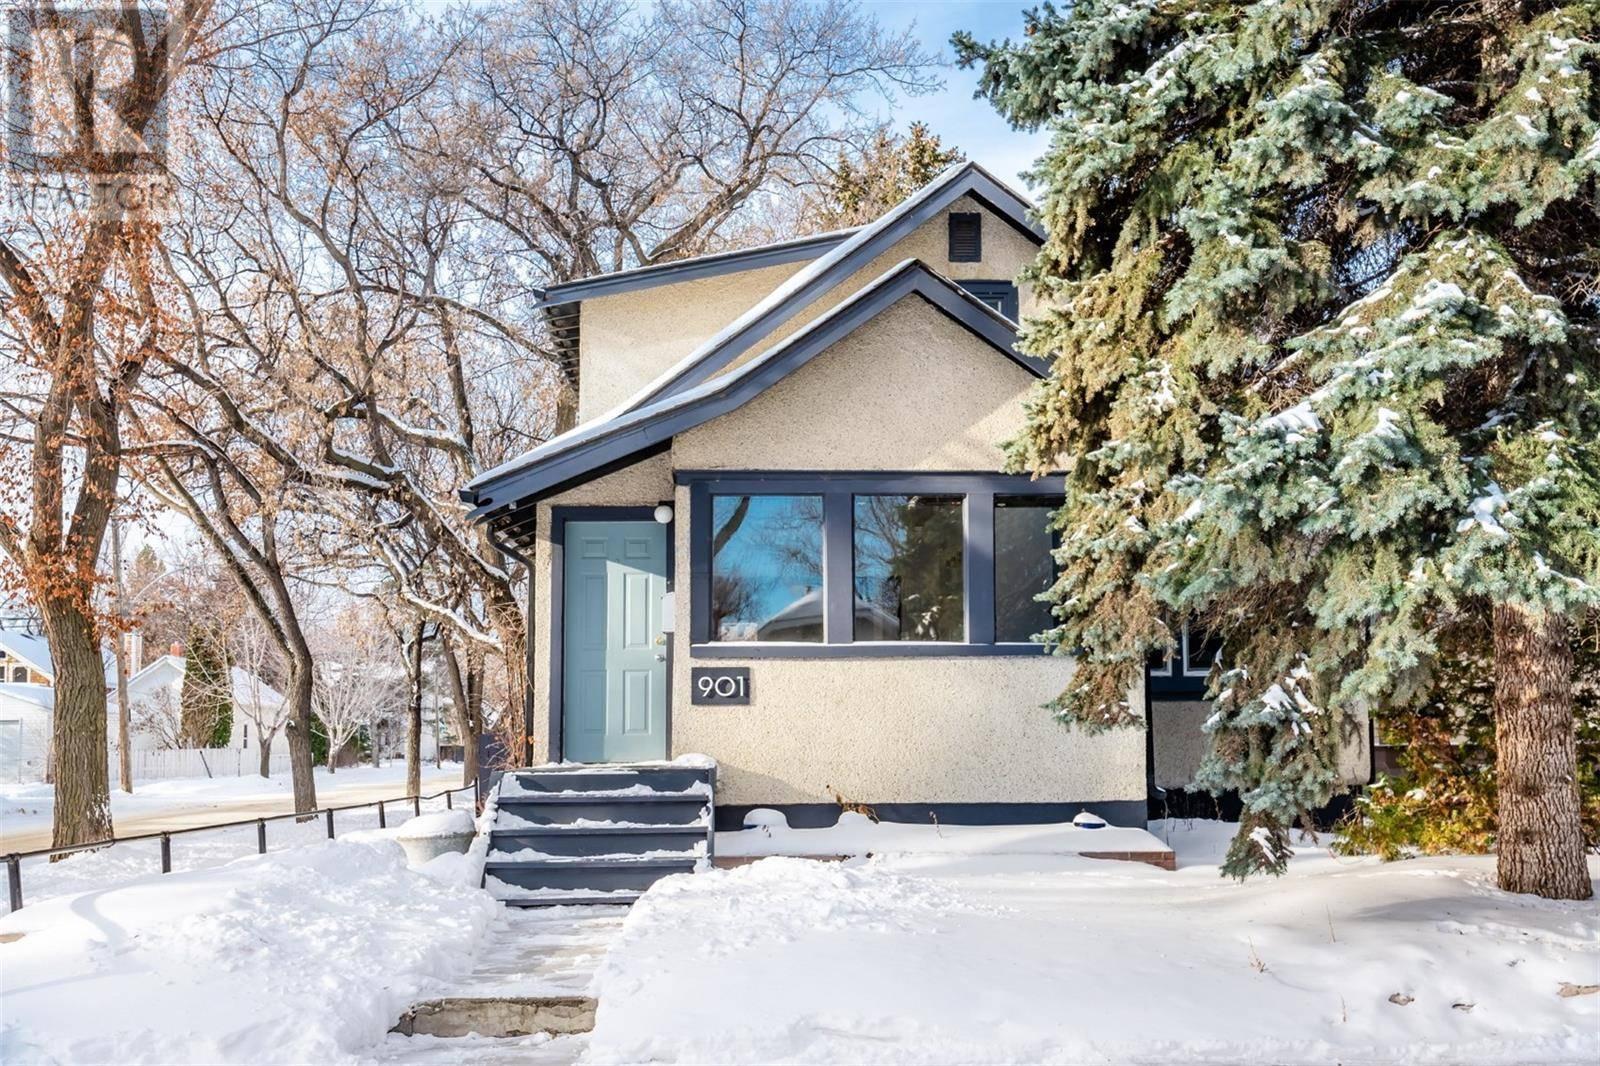 House for sale at 901 9th Ave N Saskatoon Saskatchewan - MLS: SK797514